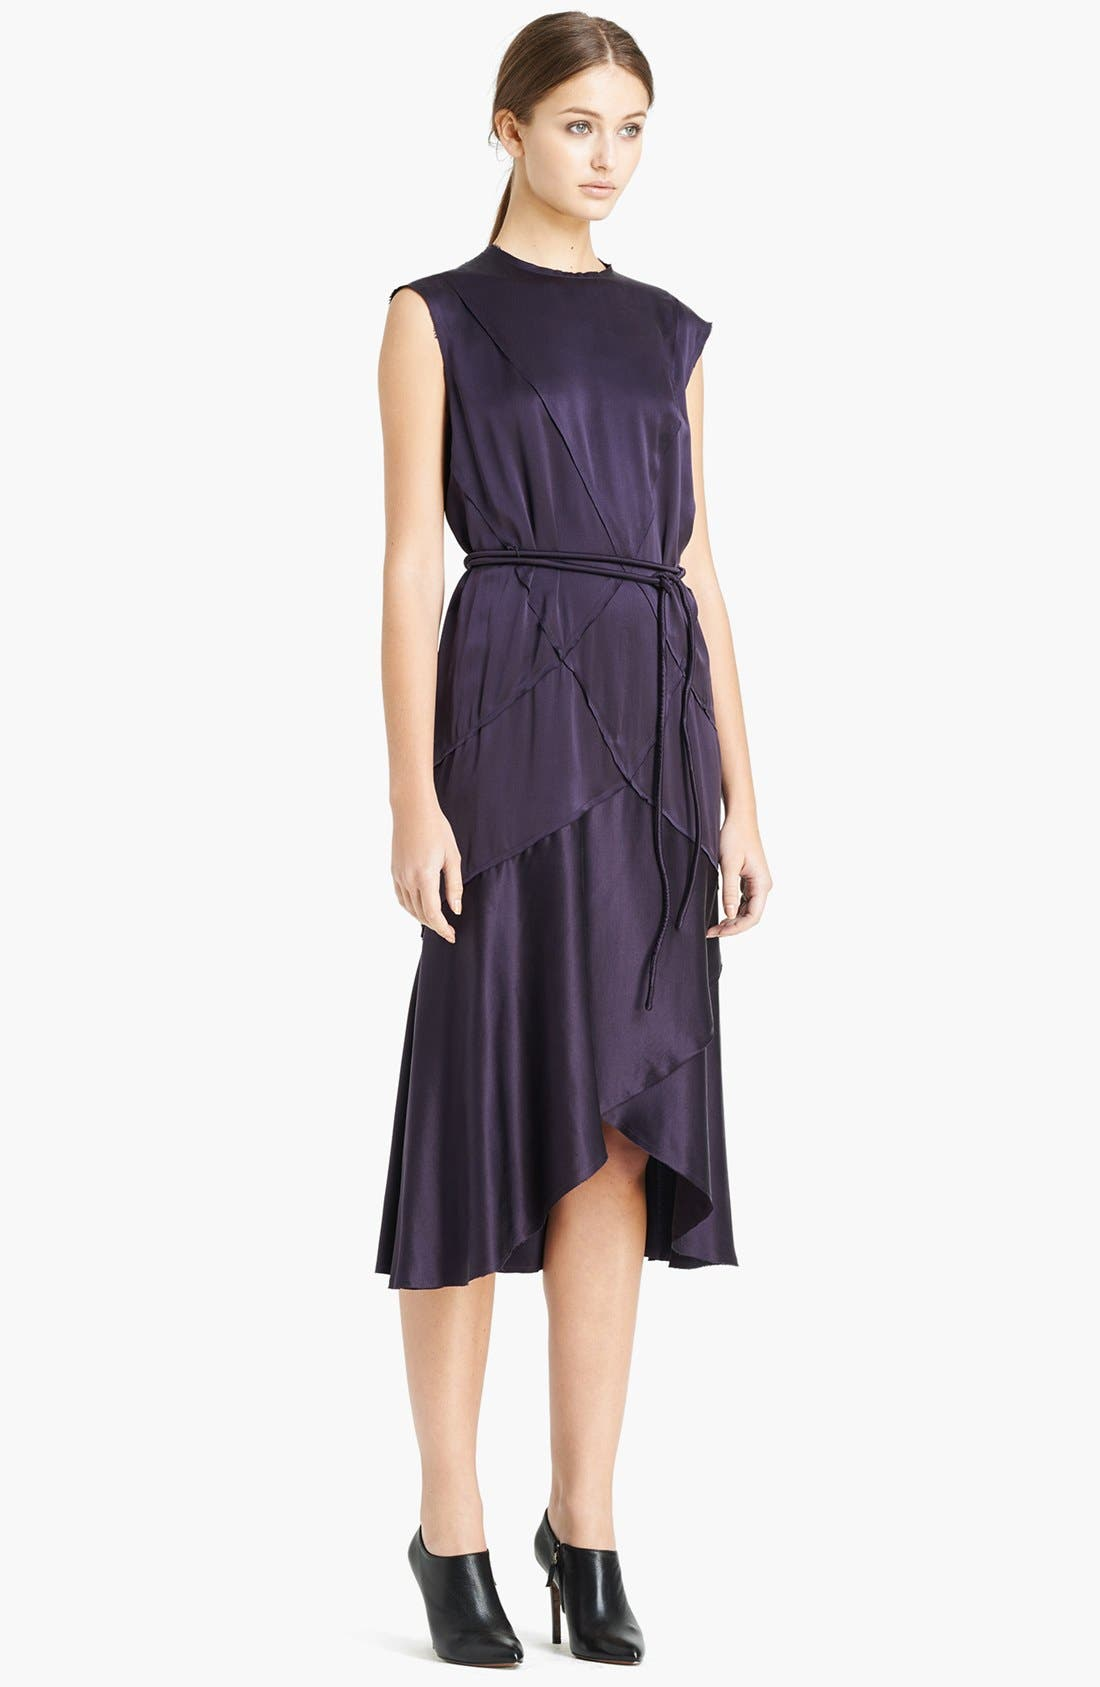 Main Image - Lanvin Sleeveless Satin Dress